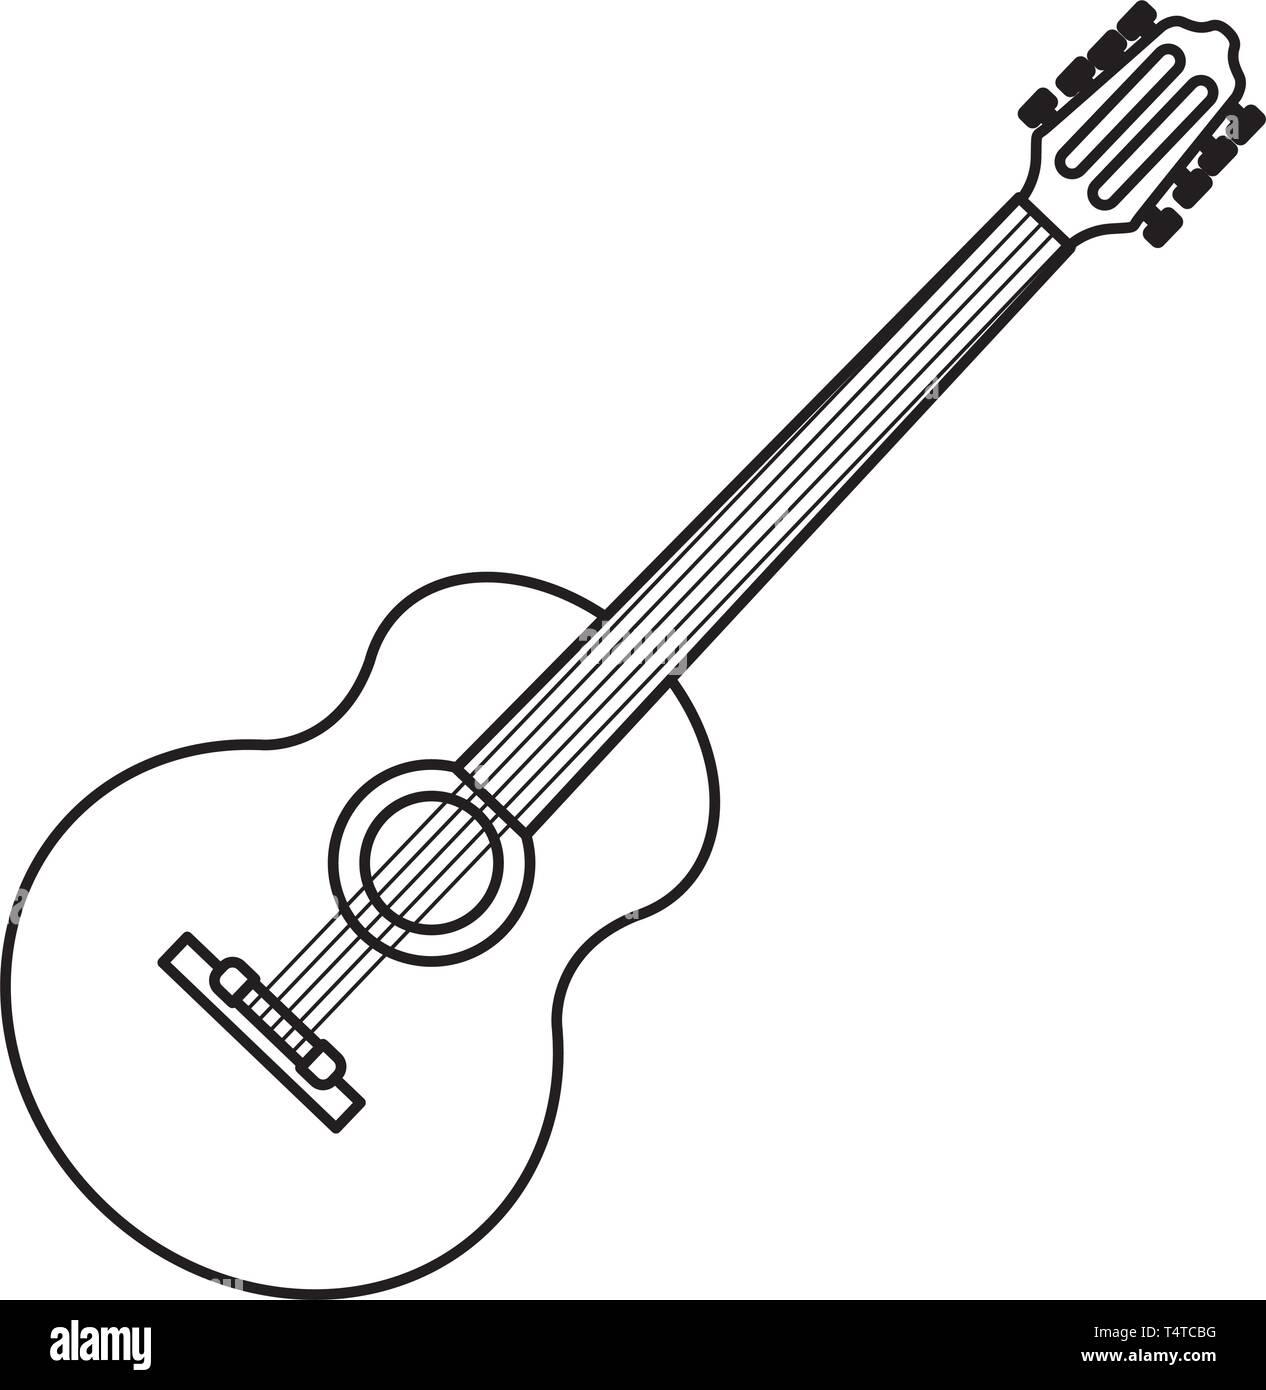 Guitar Icon Cartoon Black And White Stock Vector Image Art Alamy